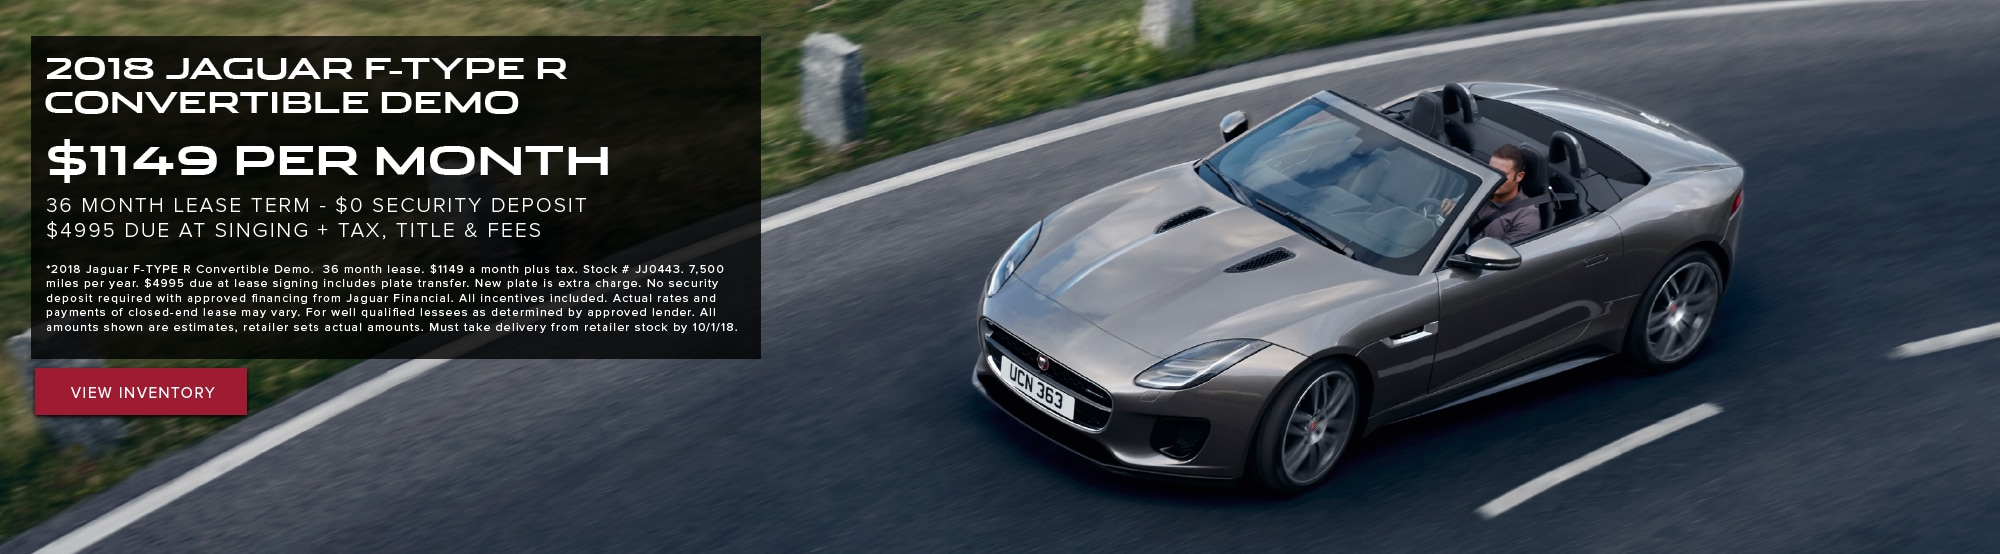 Troy Jaguar New Pre Owned Jaguar Cars